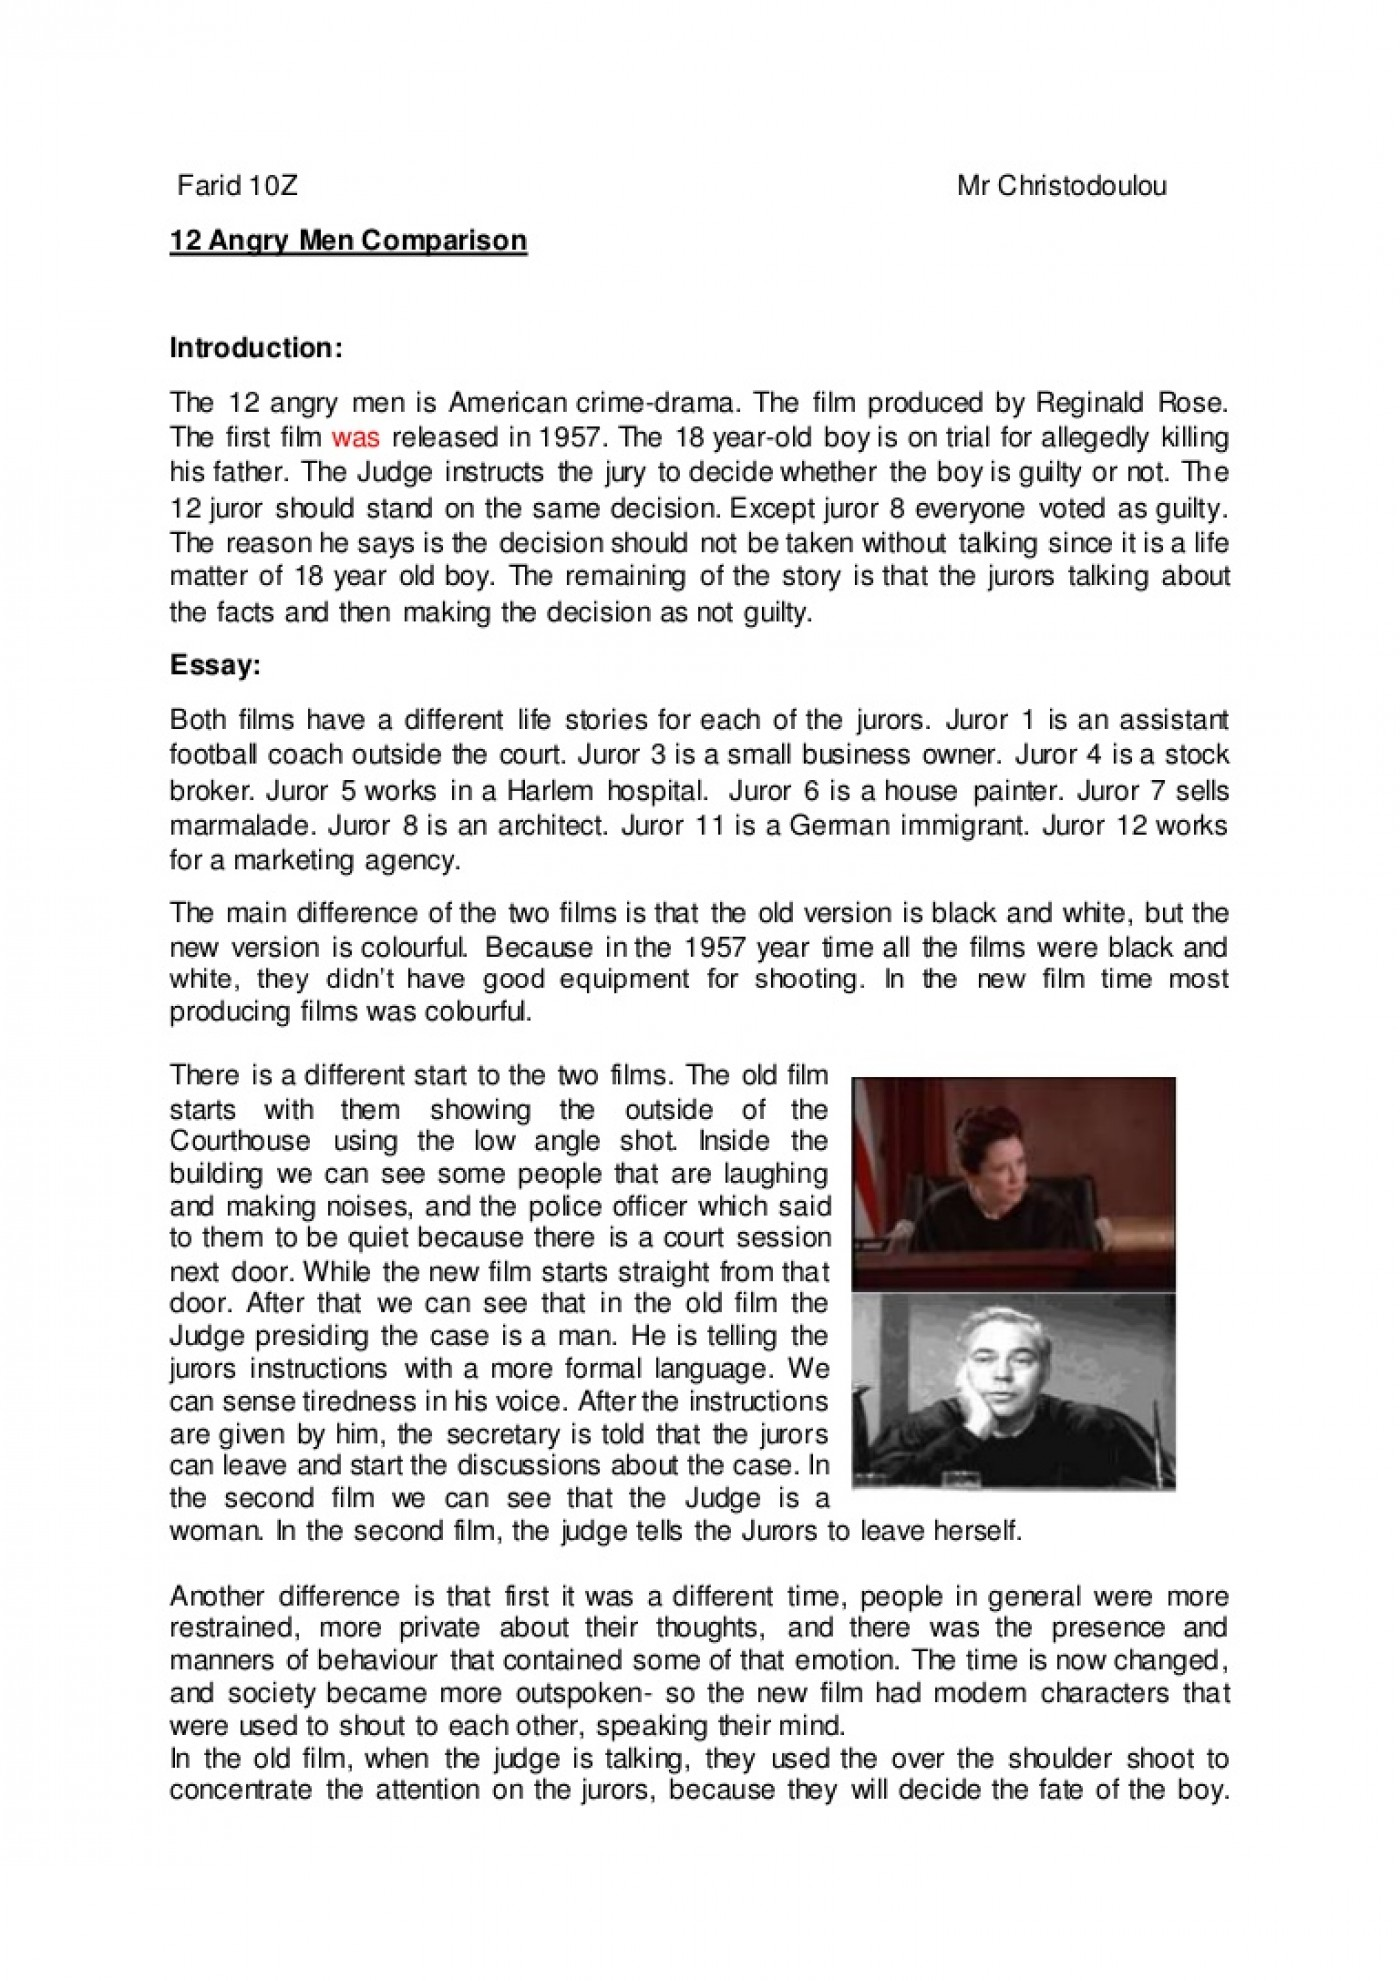 004 Essay Example Angry Men 12angrymencomparison Thumbnail Impressive 12 1400